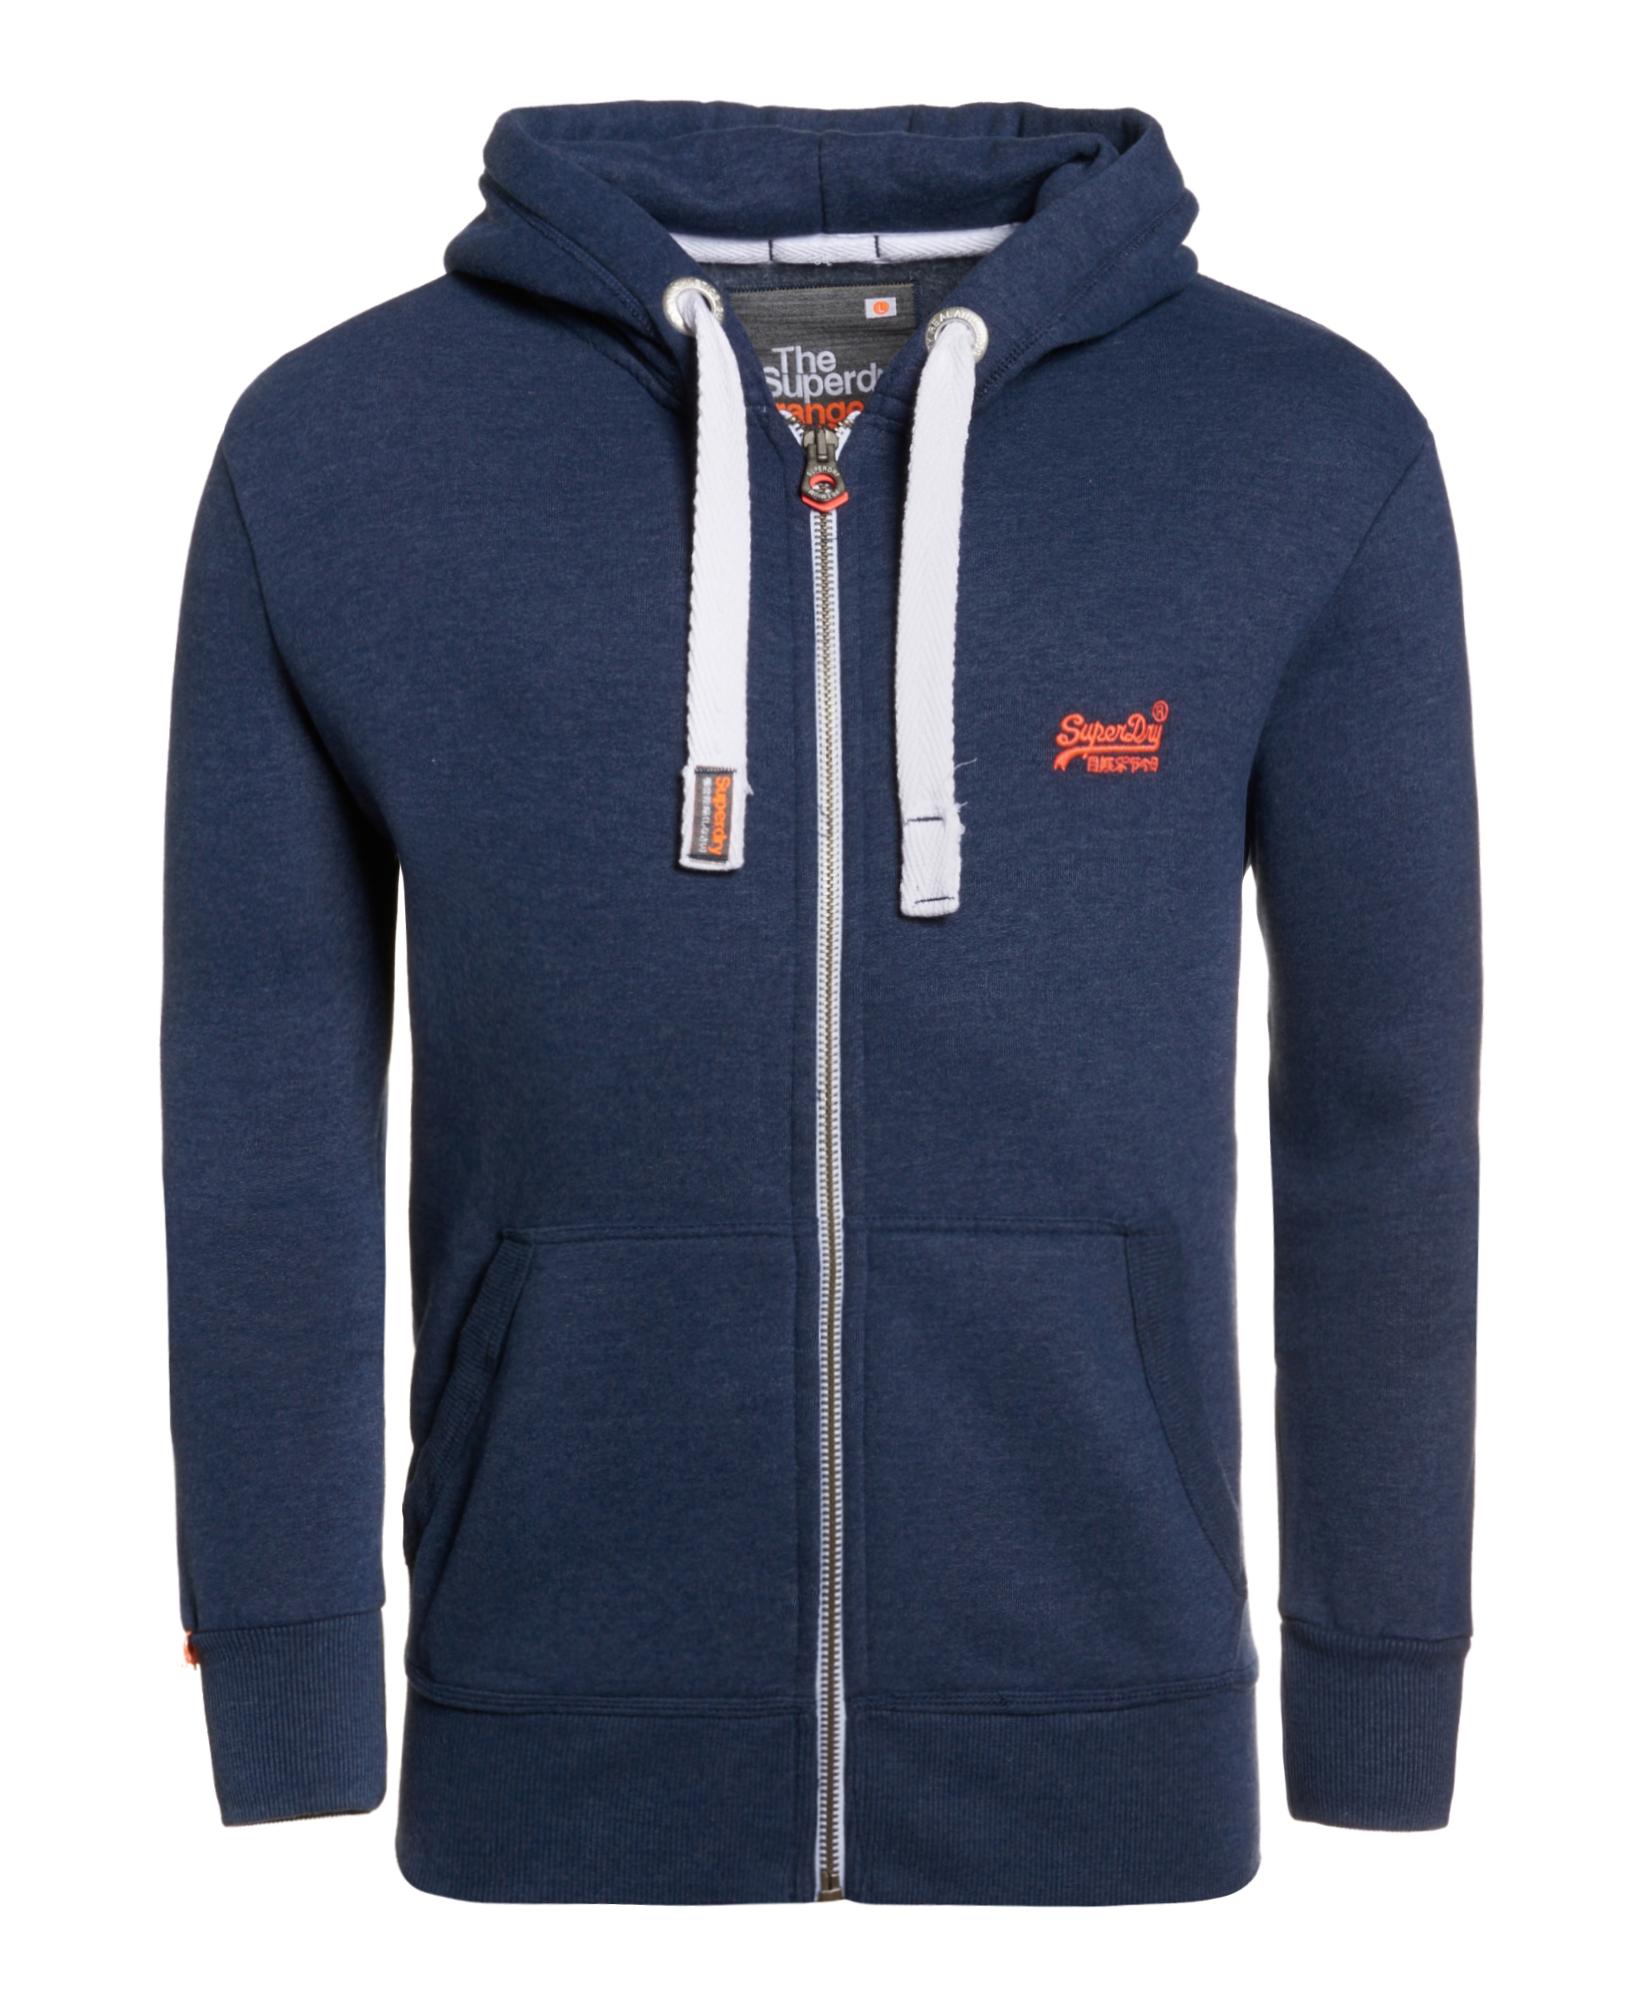 neuer herren superdry orange label zip hoodie princeton blue marl ebay. Black Bedroom Furniture Sets. Home Design Ideas